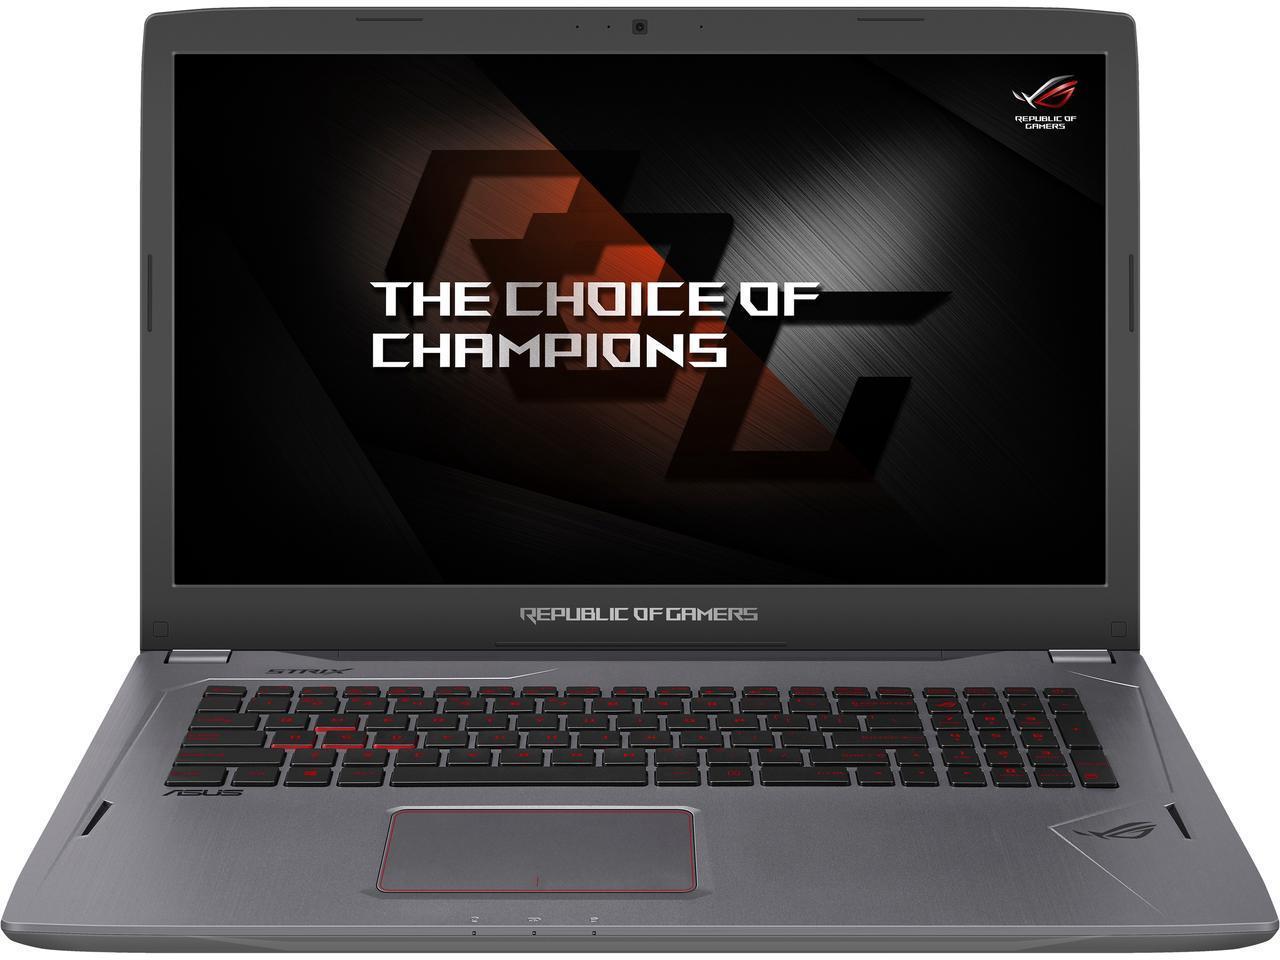 "$1279 YMMV ASUS 17.3"" Laptop G-sync 120hz, 1070, 7700."